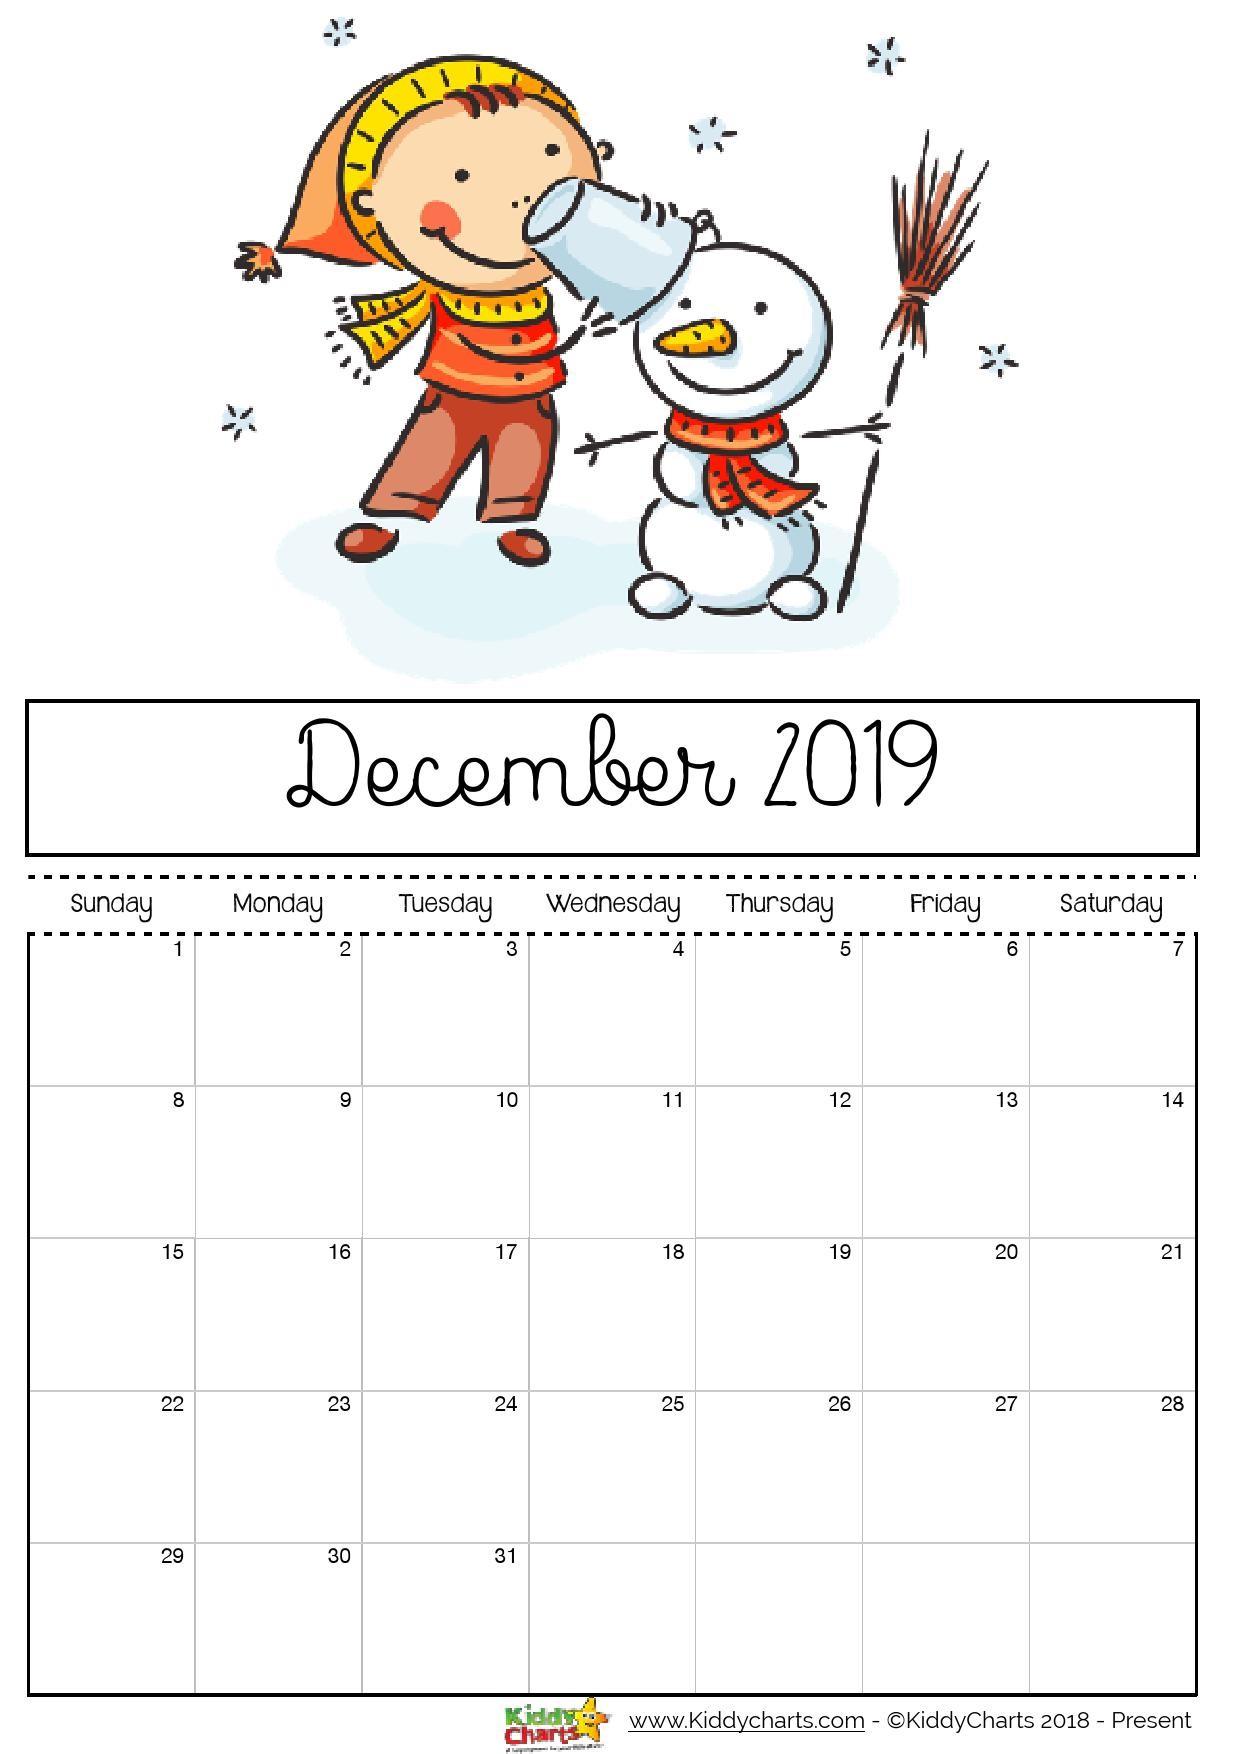 Printable Calendar Pages 2019 Free Printable 2019 Calendar for Kids